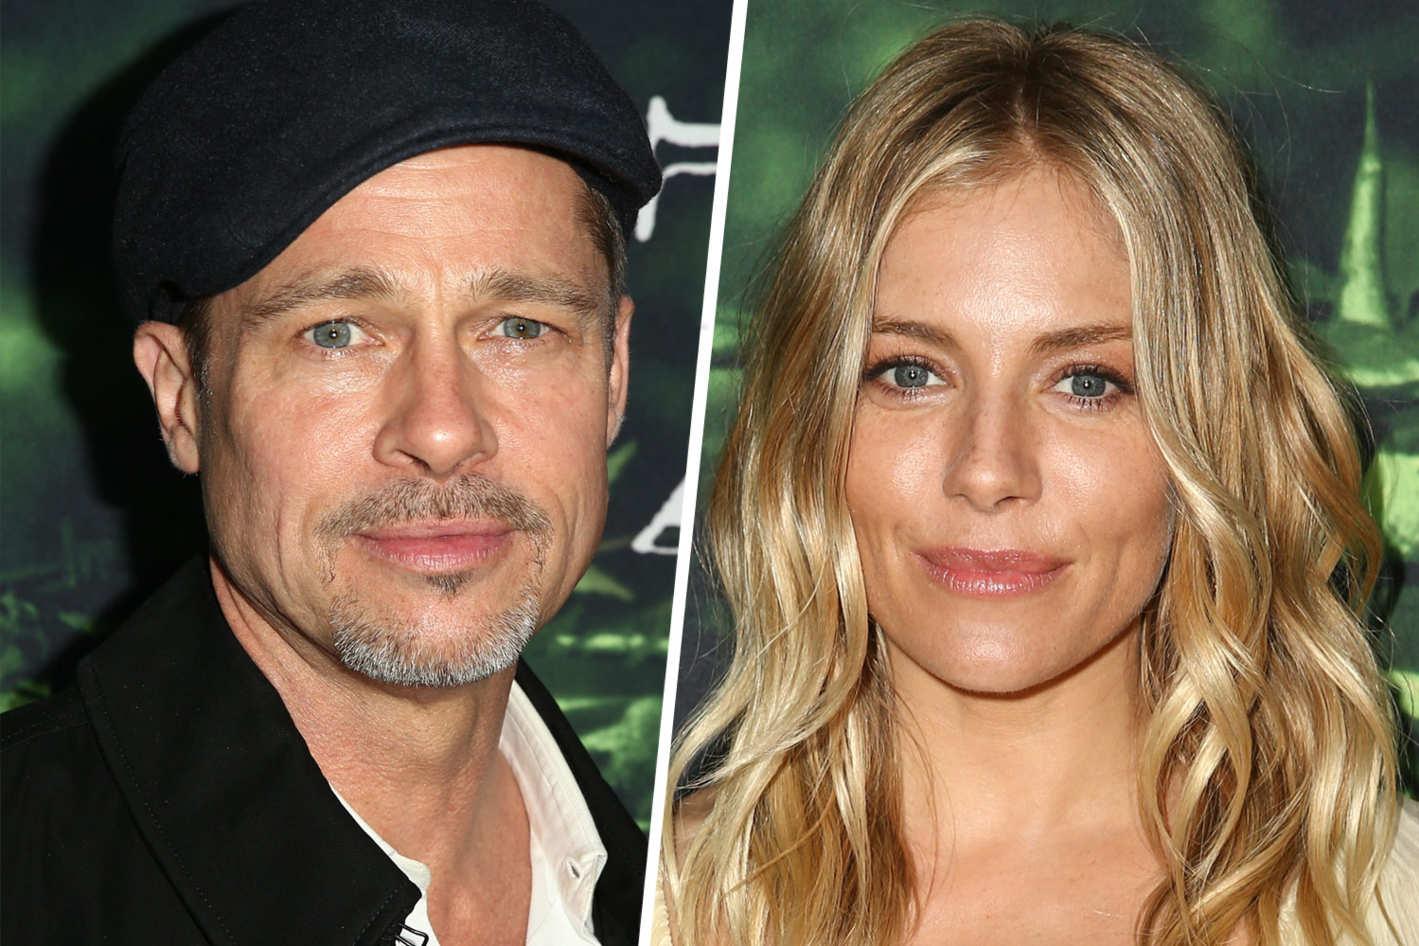 Brad Pitt dimentica Angelina e flirta con Sienna Miller